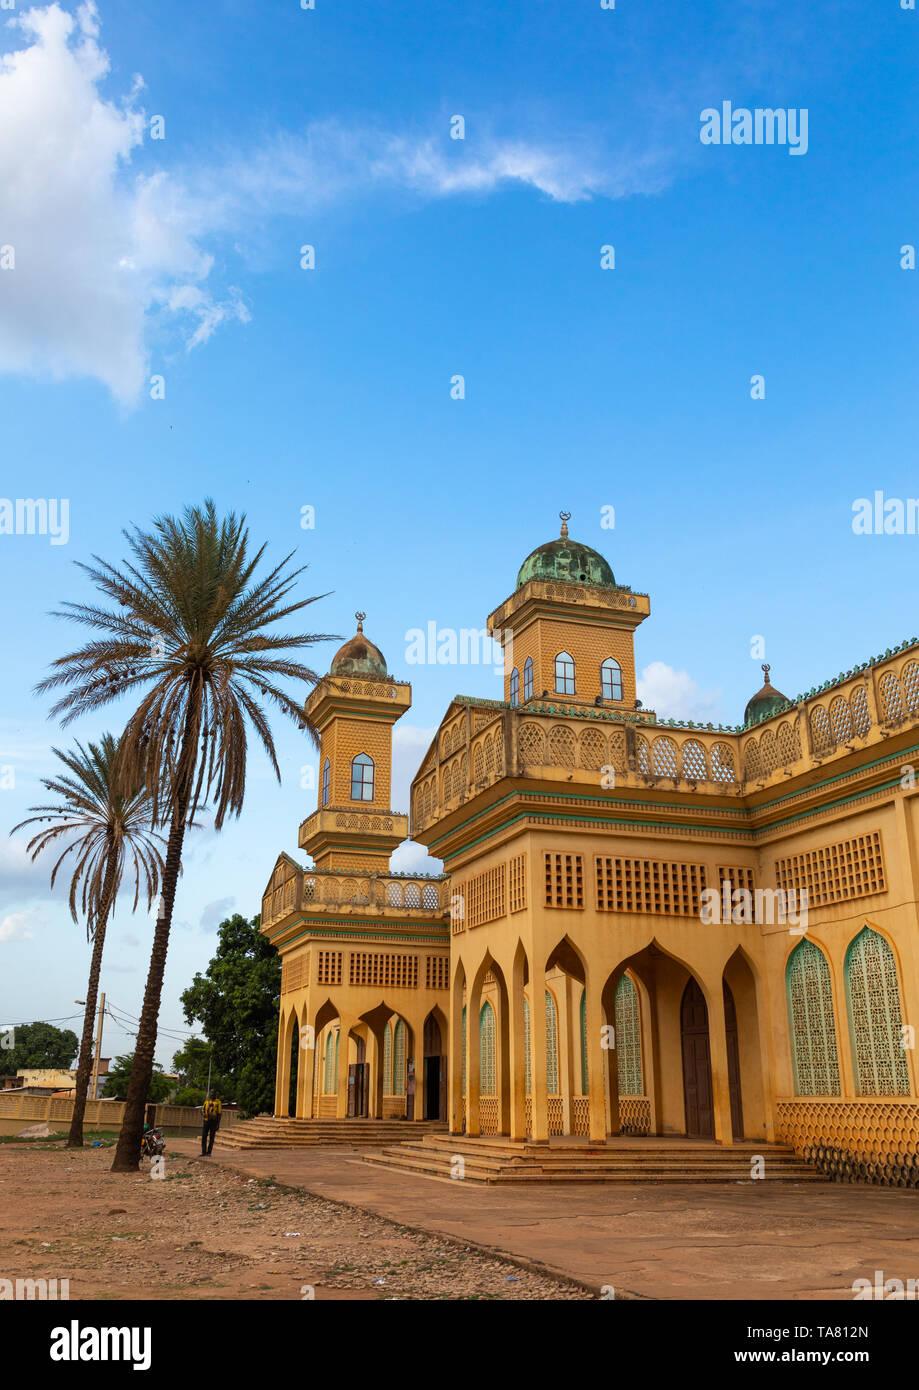 Grand mosque, Poro region, Korhogo, Ivory Coast Stock Photo